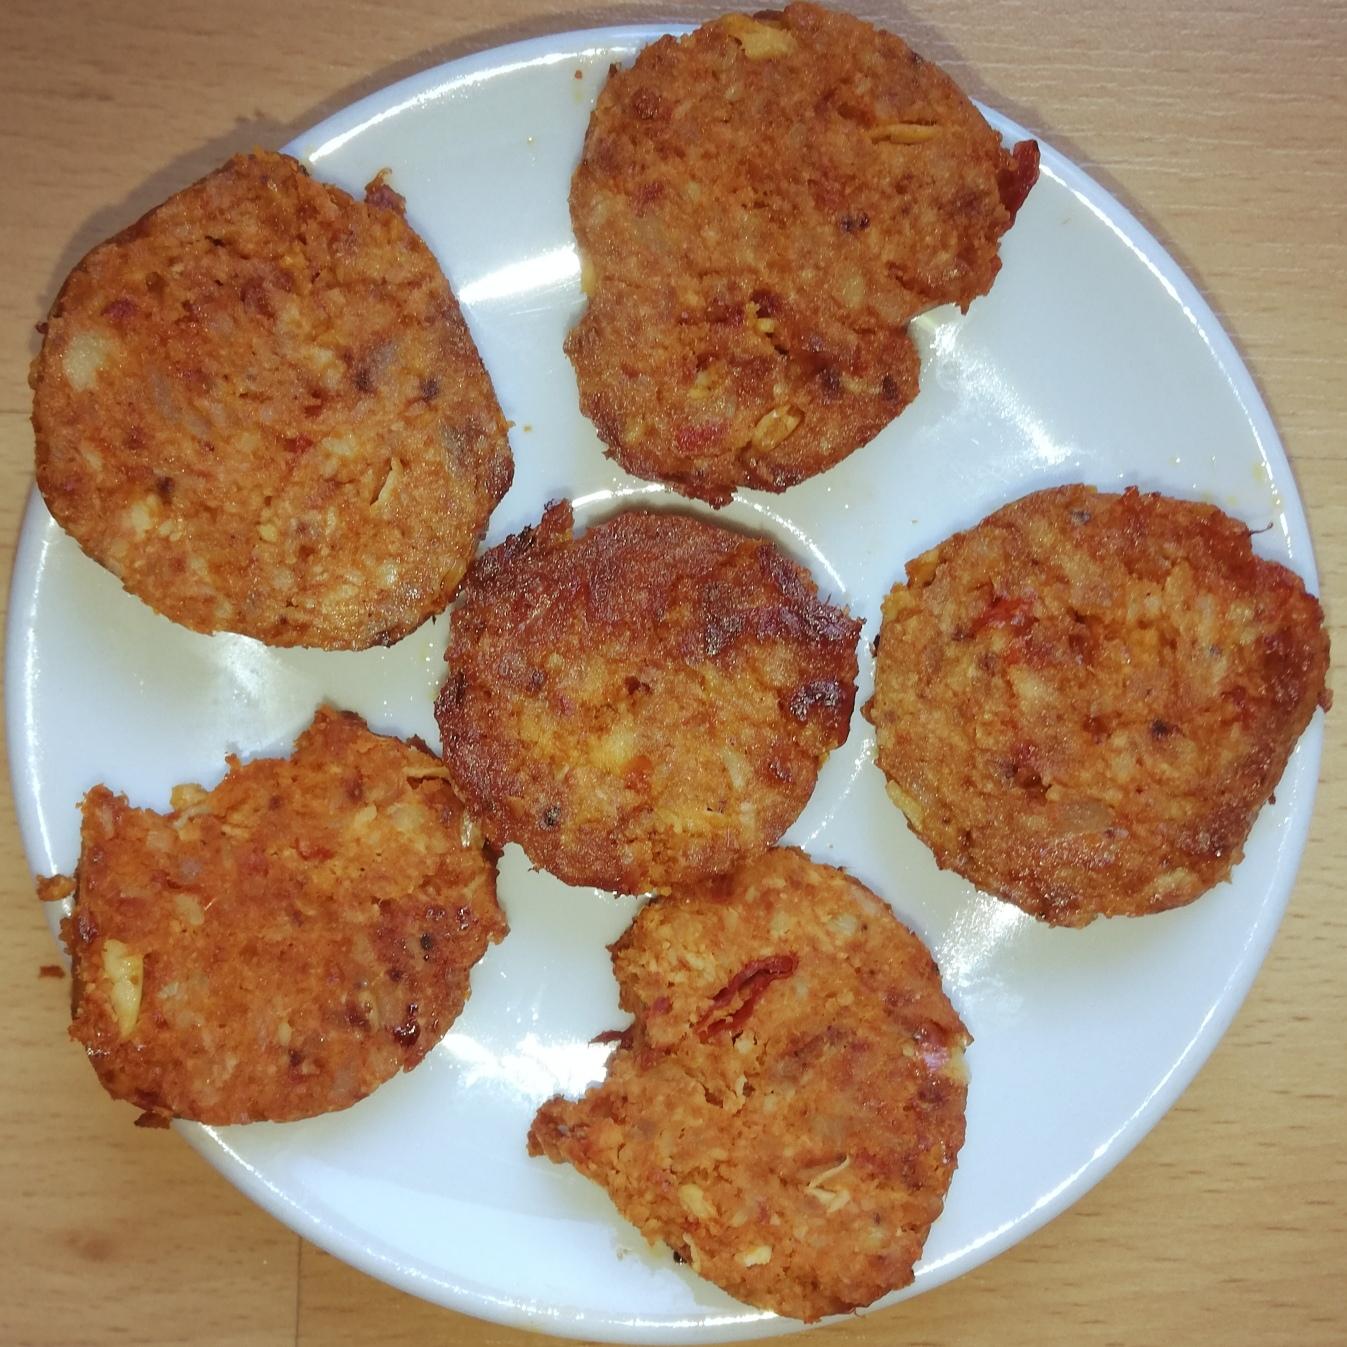 Chorizo casero con carne de pollo